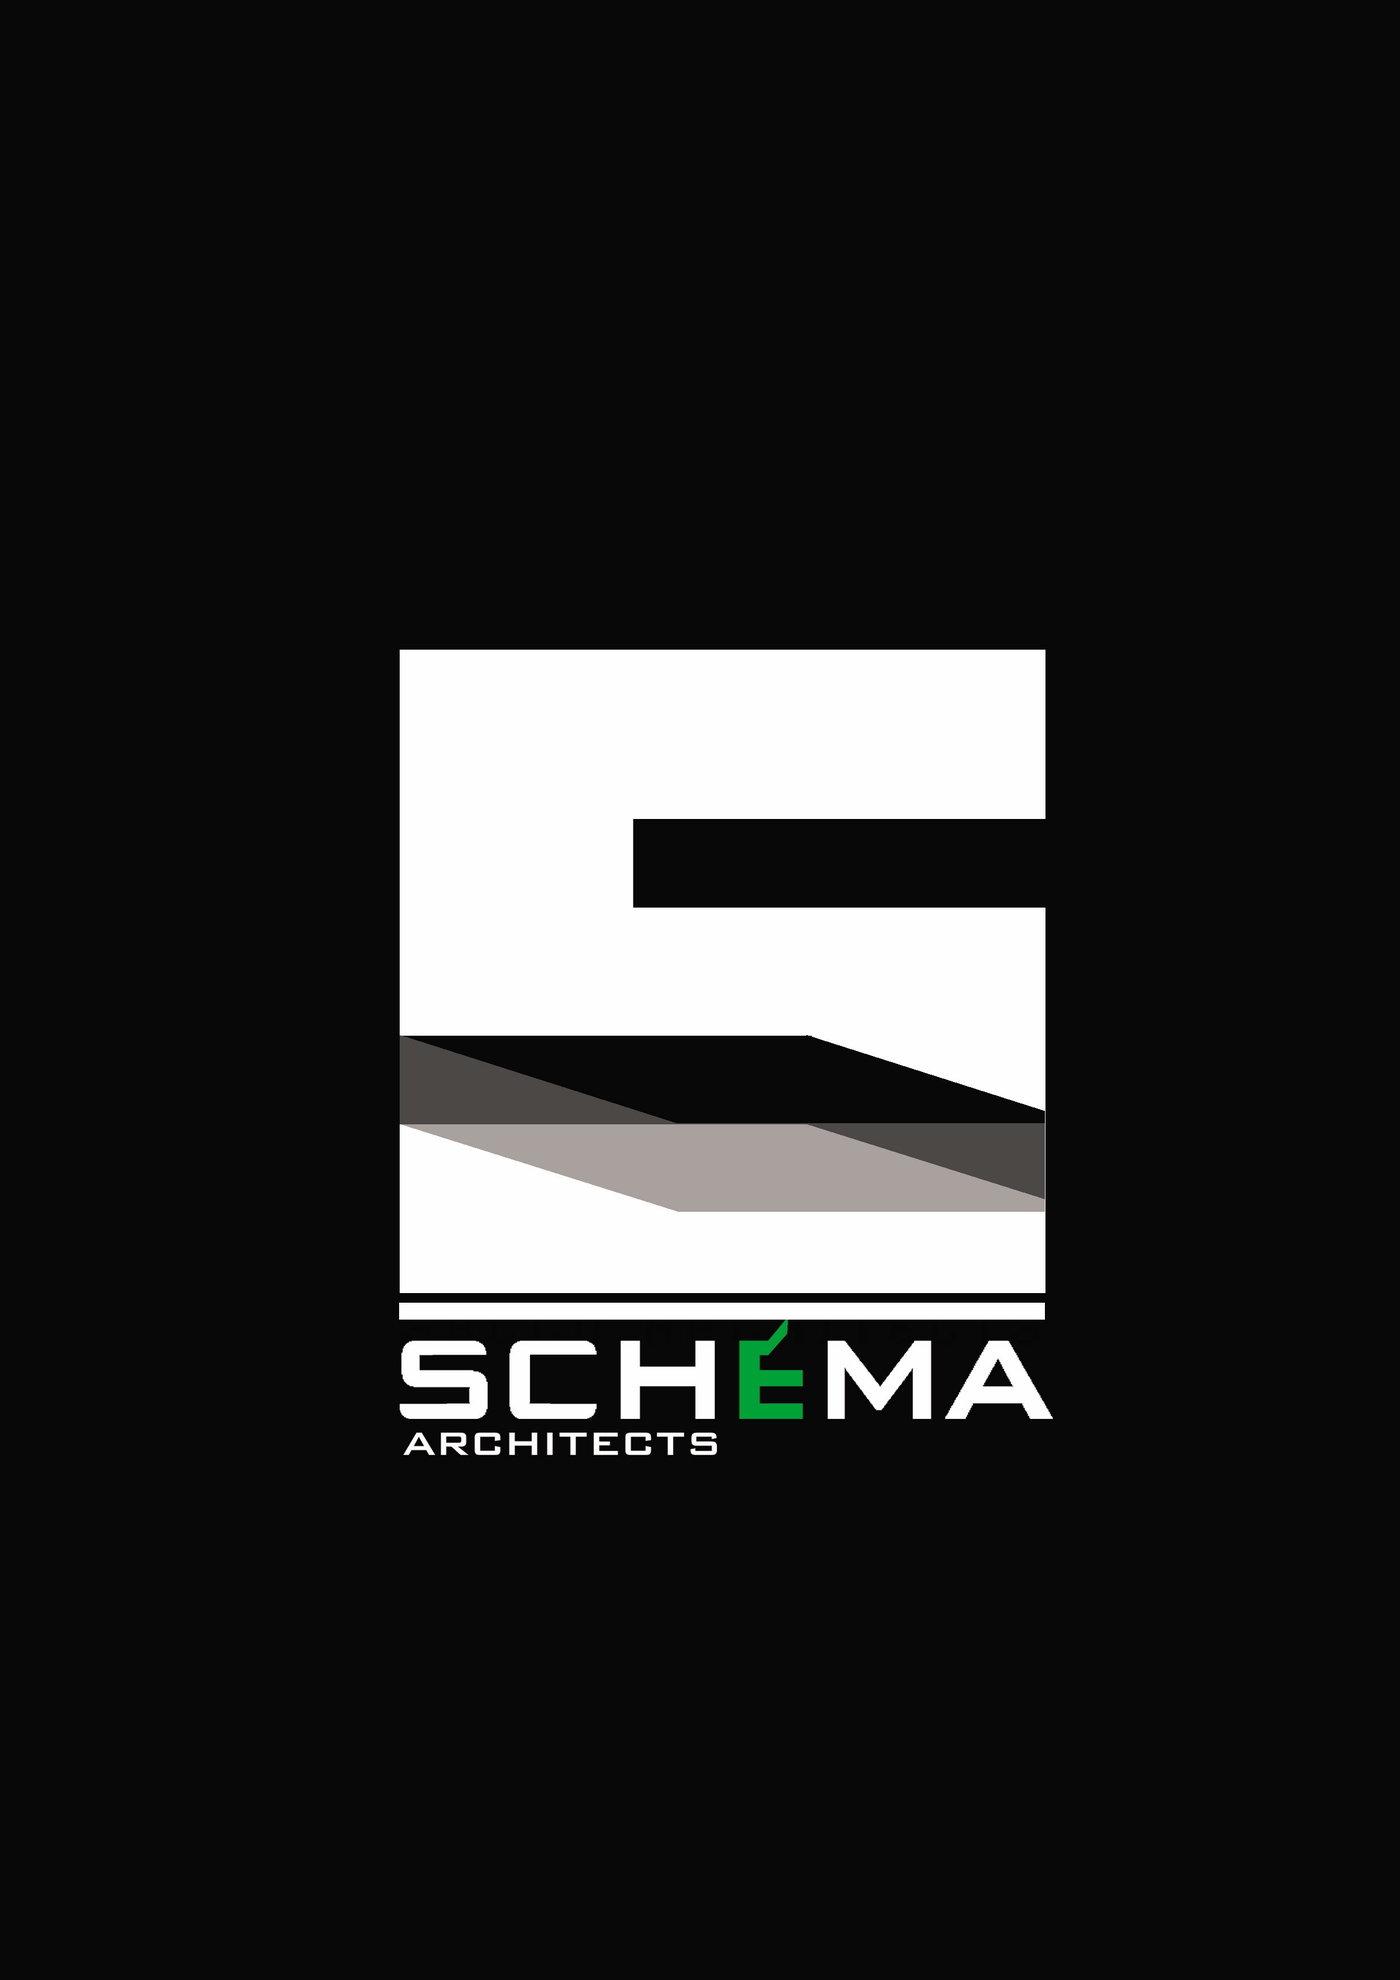 Logo Design-Schema Architects by Hosein Ebrahimzade at Coroflot.com